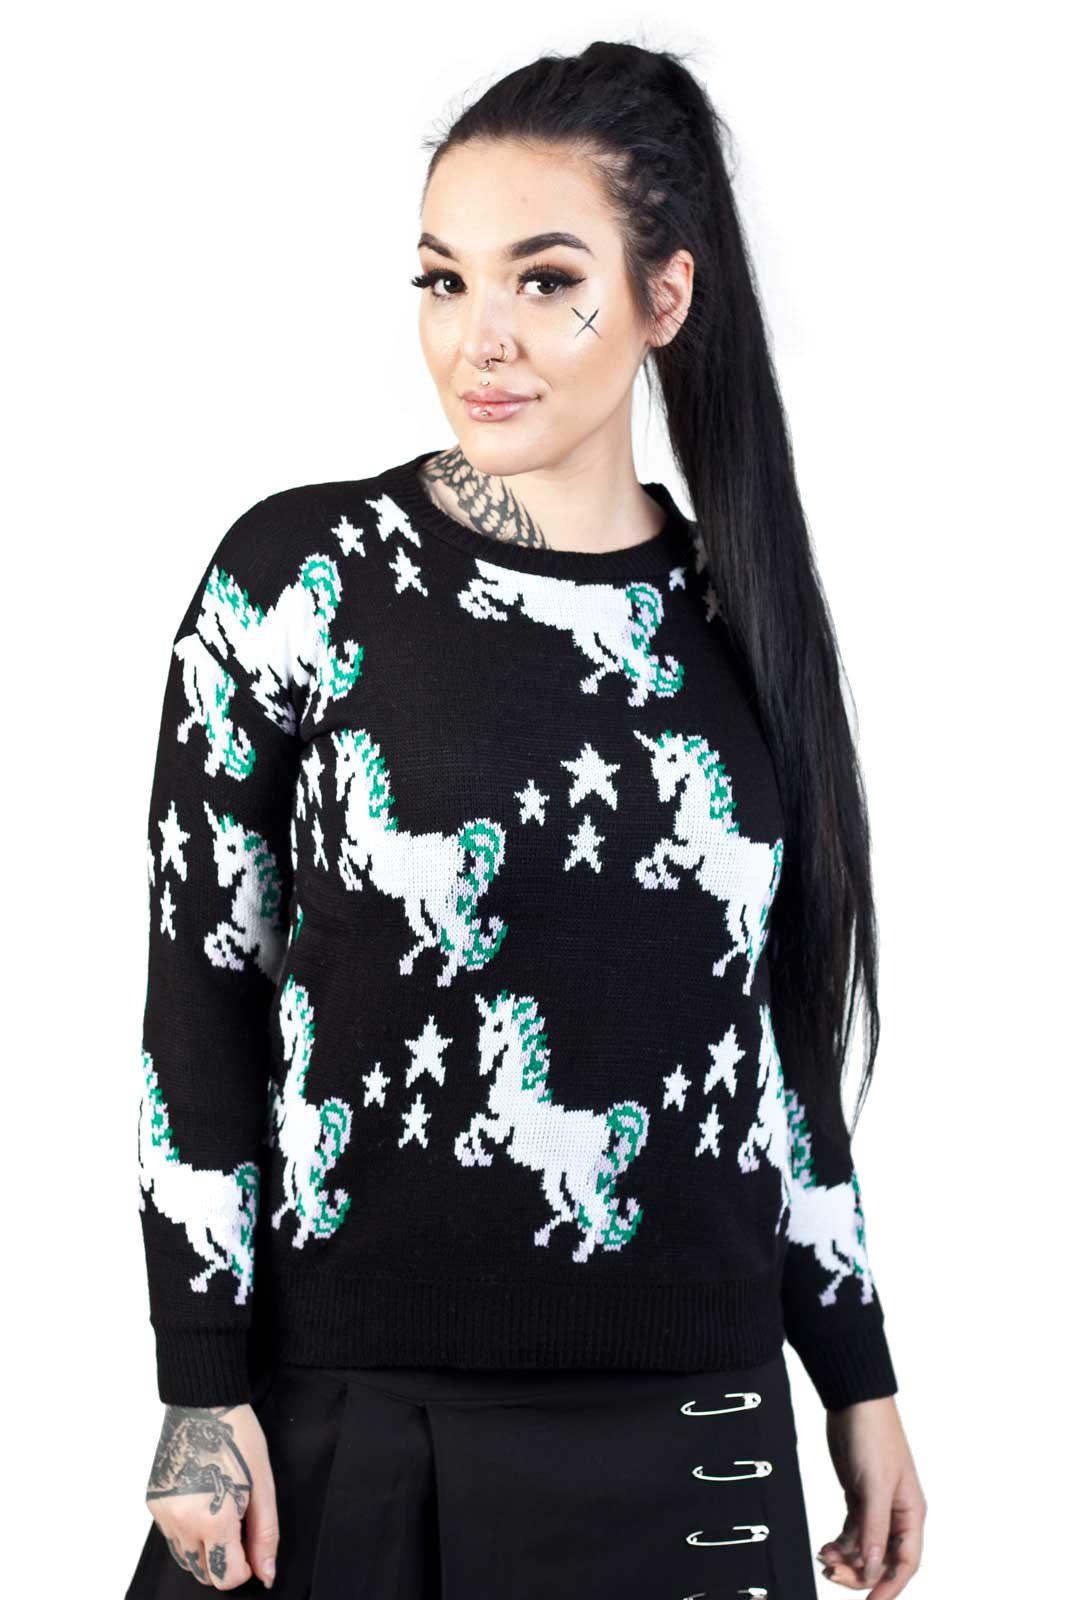 Knitted Sweater Starry Unicorn Black